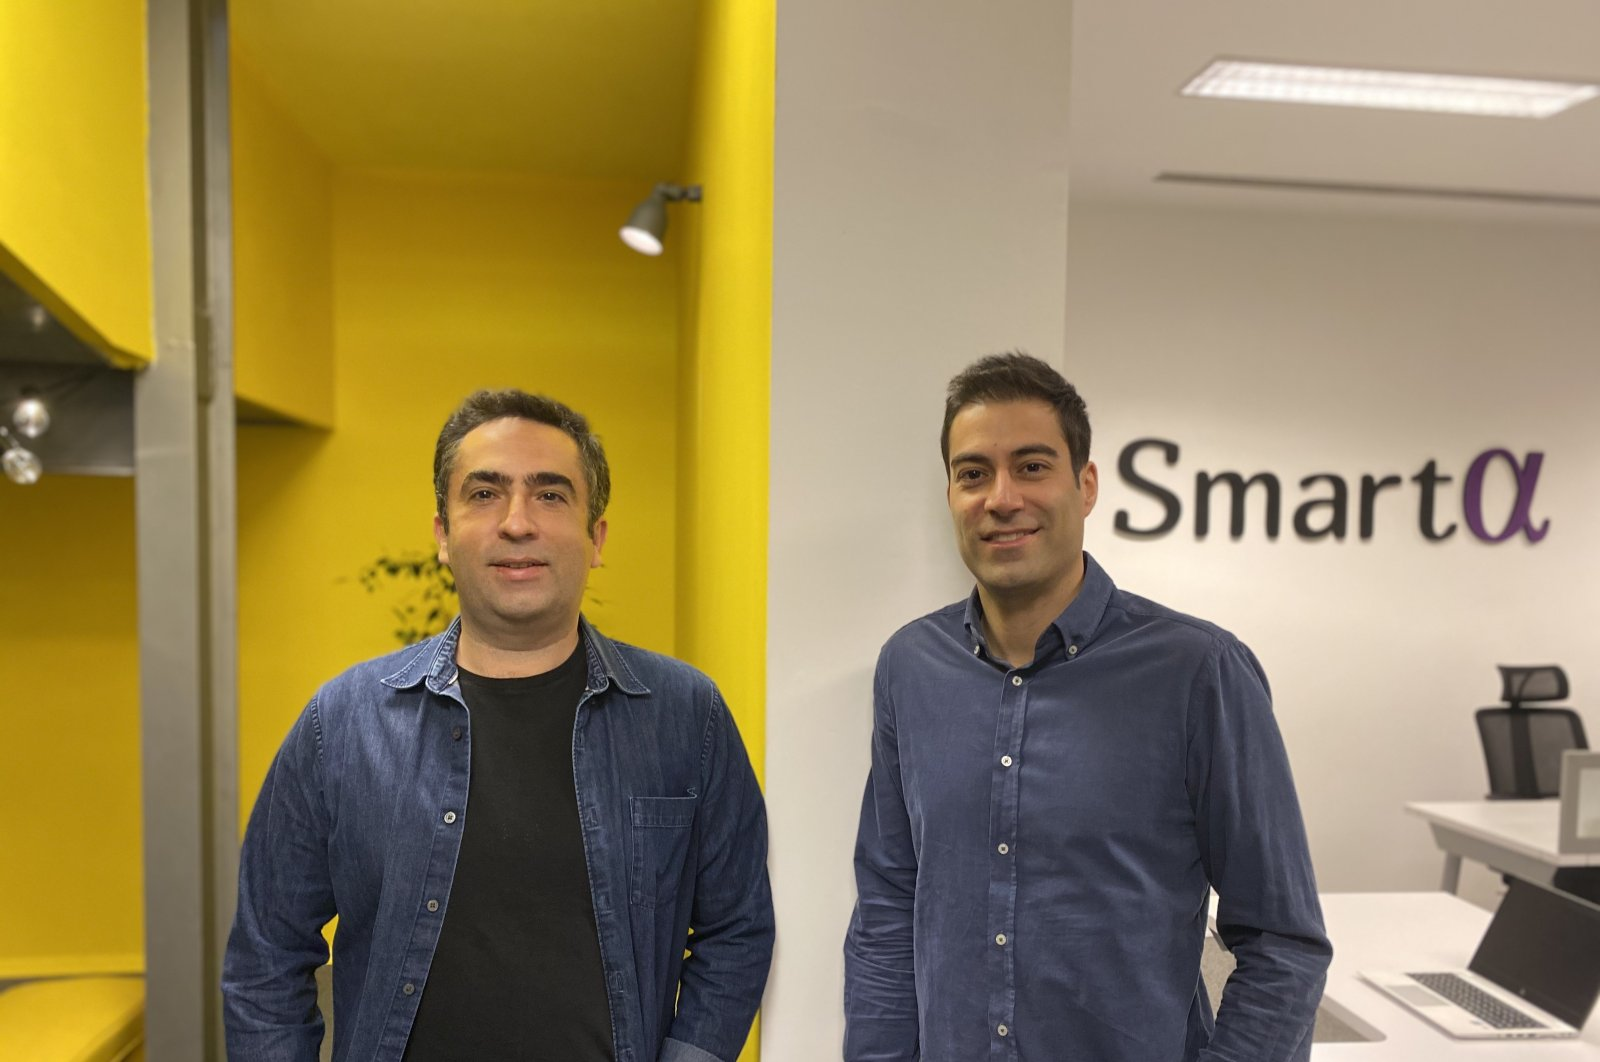 Utku Kaya (L) and Ozan Biler, co-founders of SmartAlpha. (Courtesy of SmartAlpha)